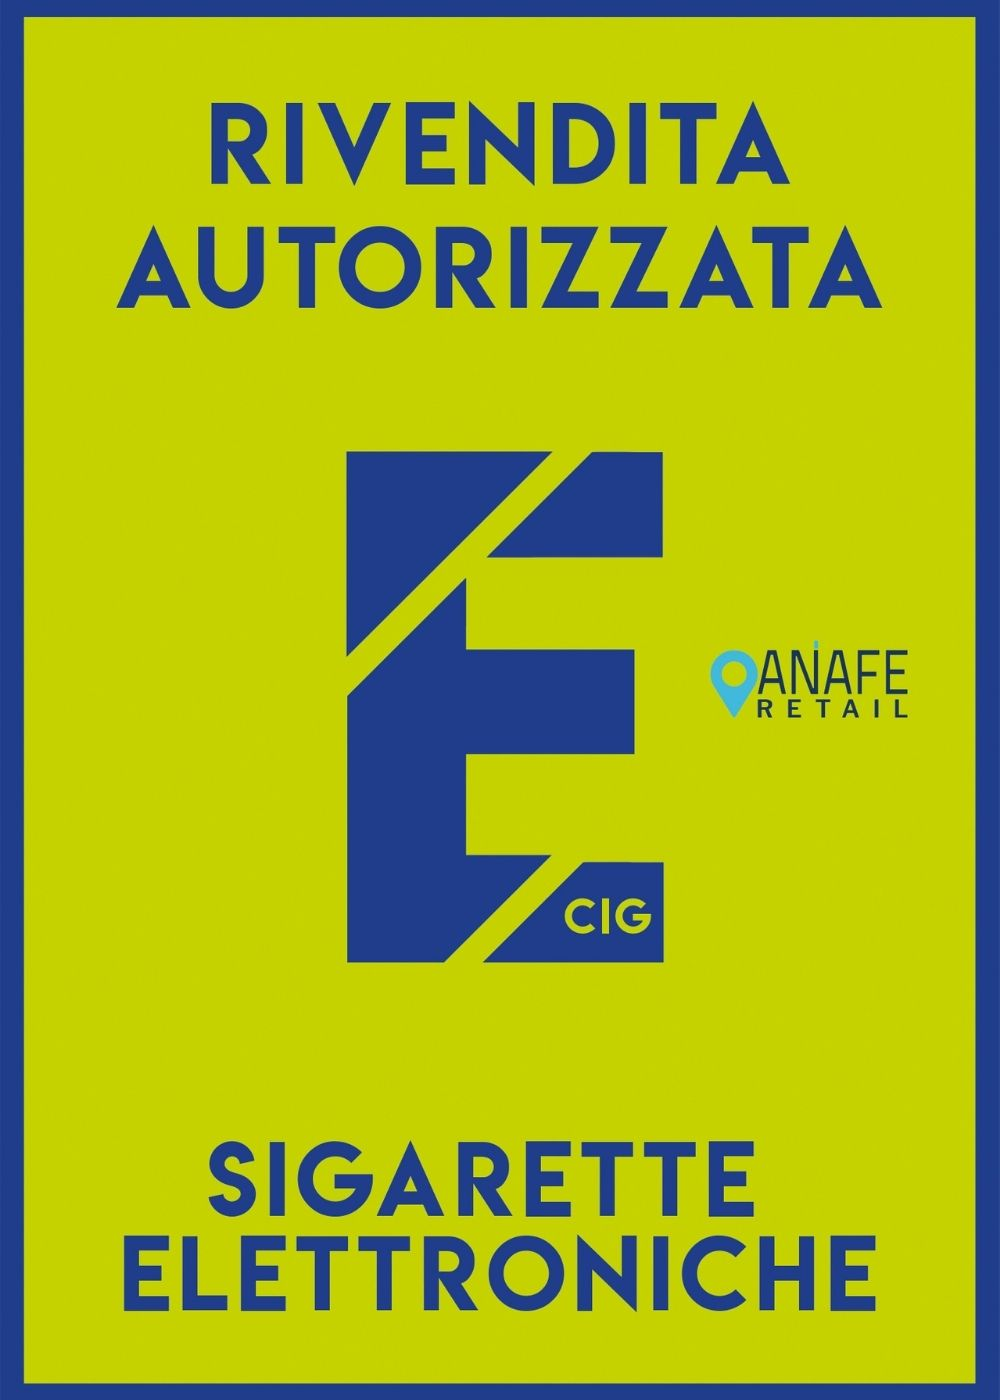 SIGARETTE ELETTRONICHE: NASCE ANAFE RETAIL